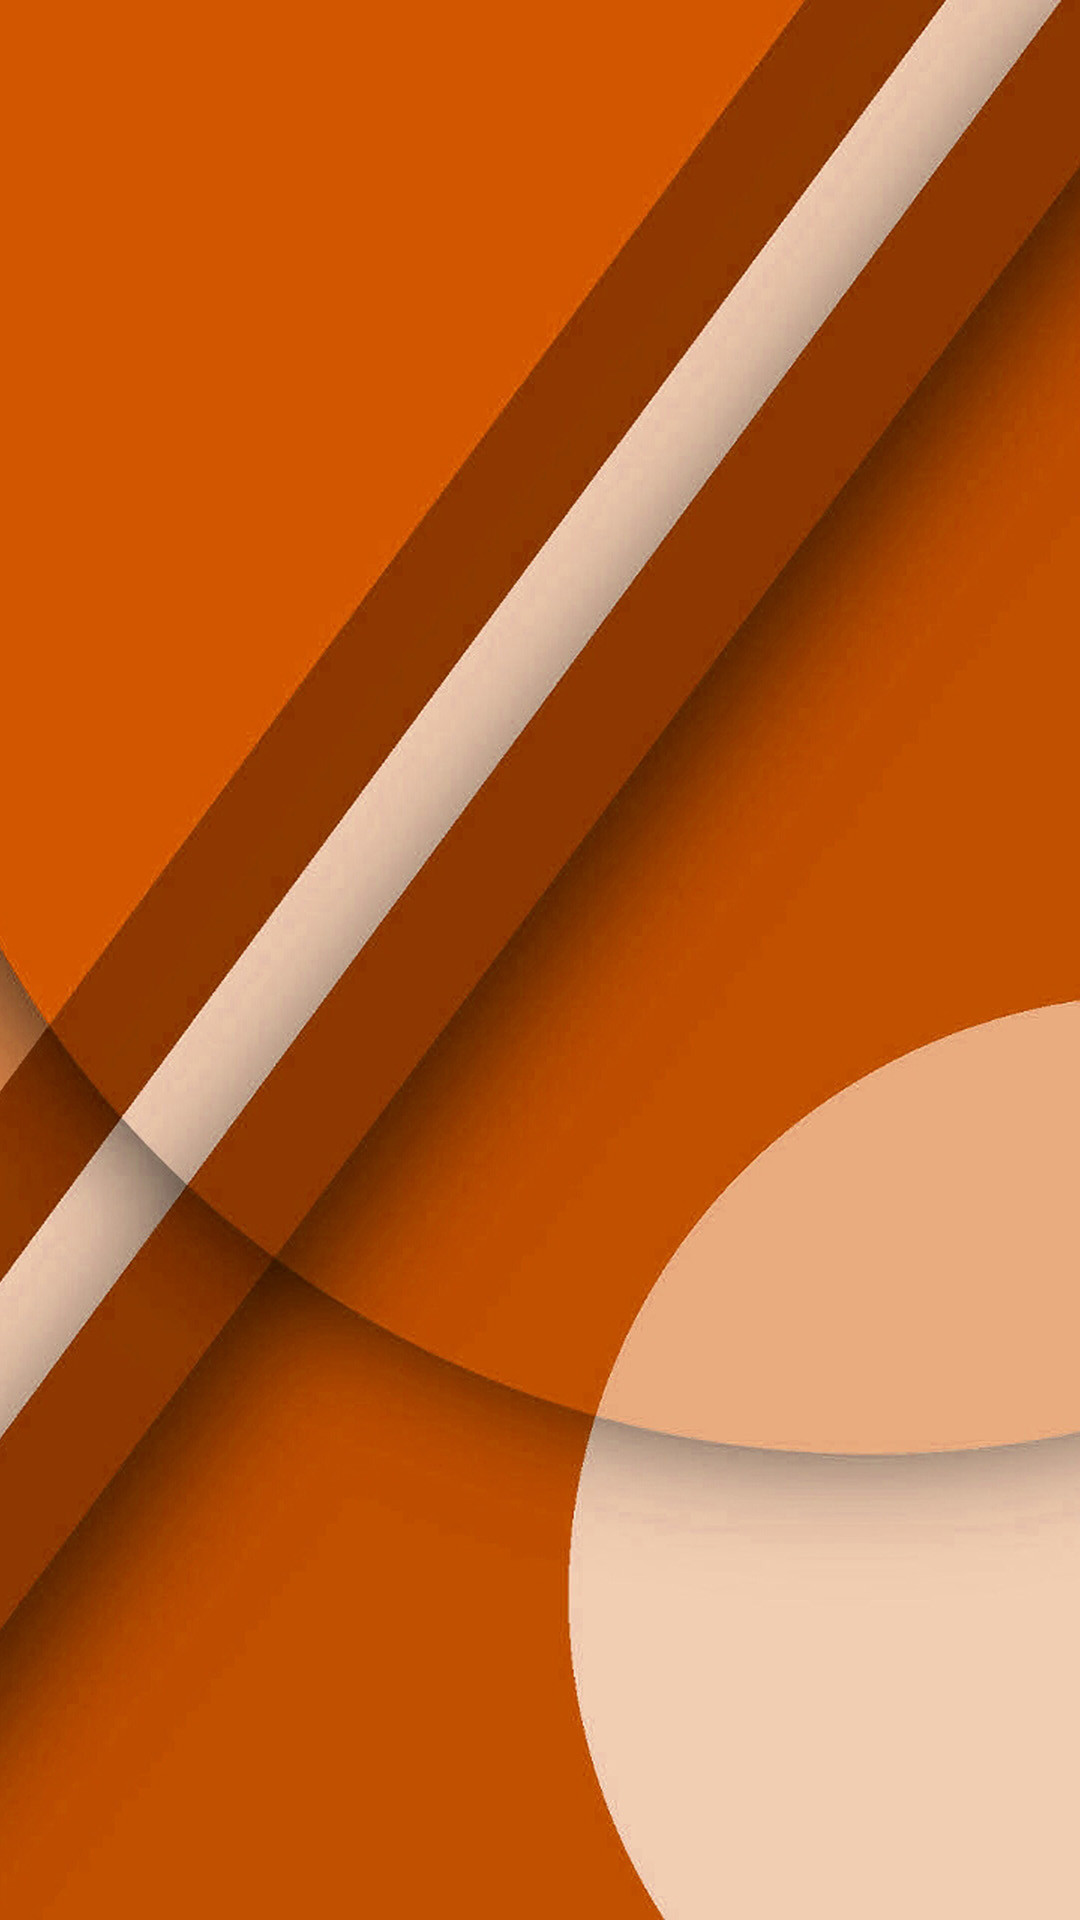 Burnt Orange Wallpaper 54 images 1080x1920